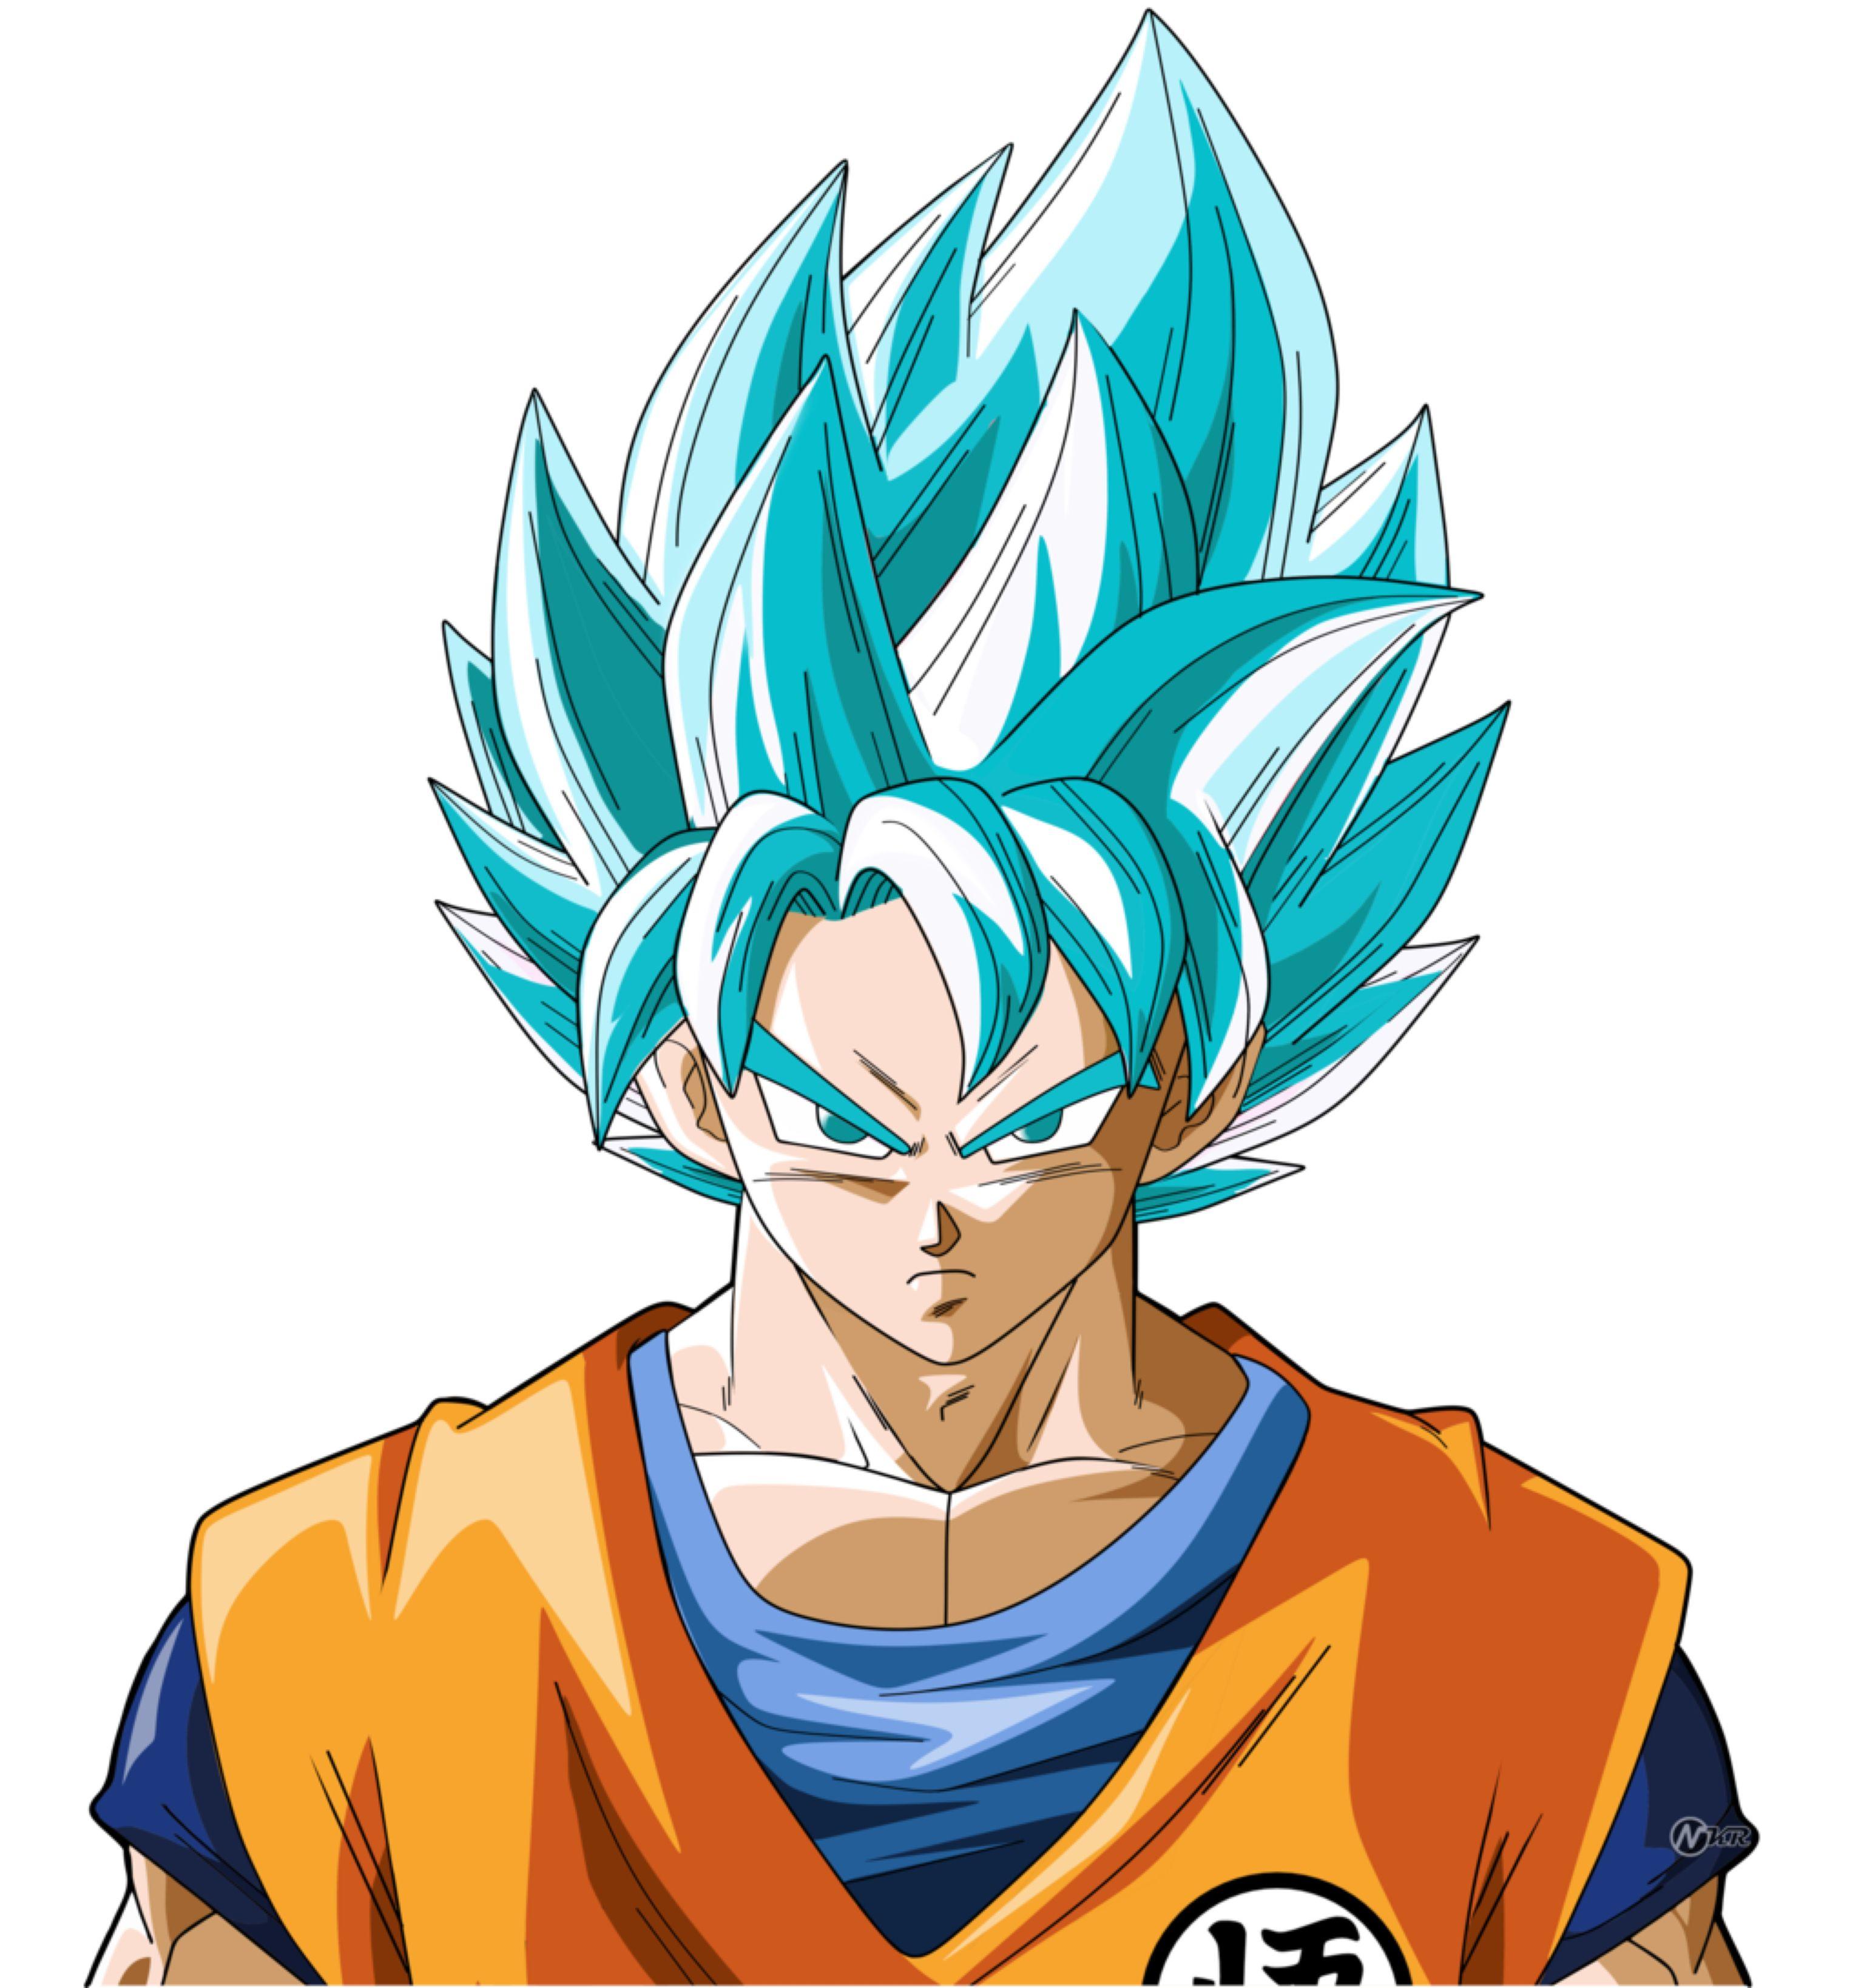 Goku ssj blue by naironkr on deviantart goku goku - San goku super saiyan 5 ...